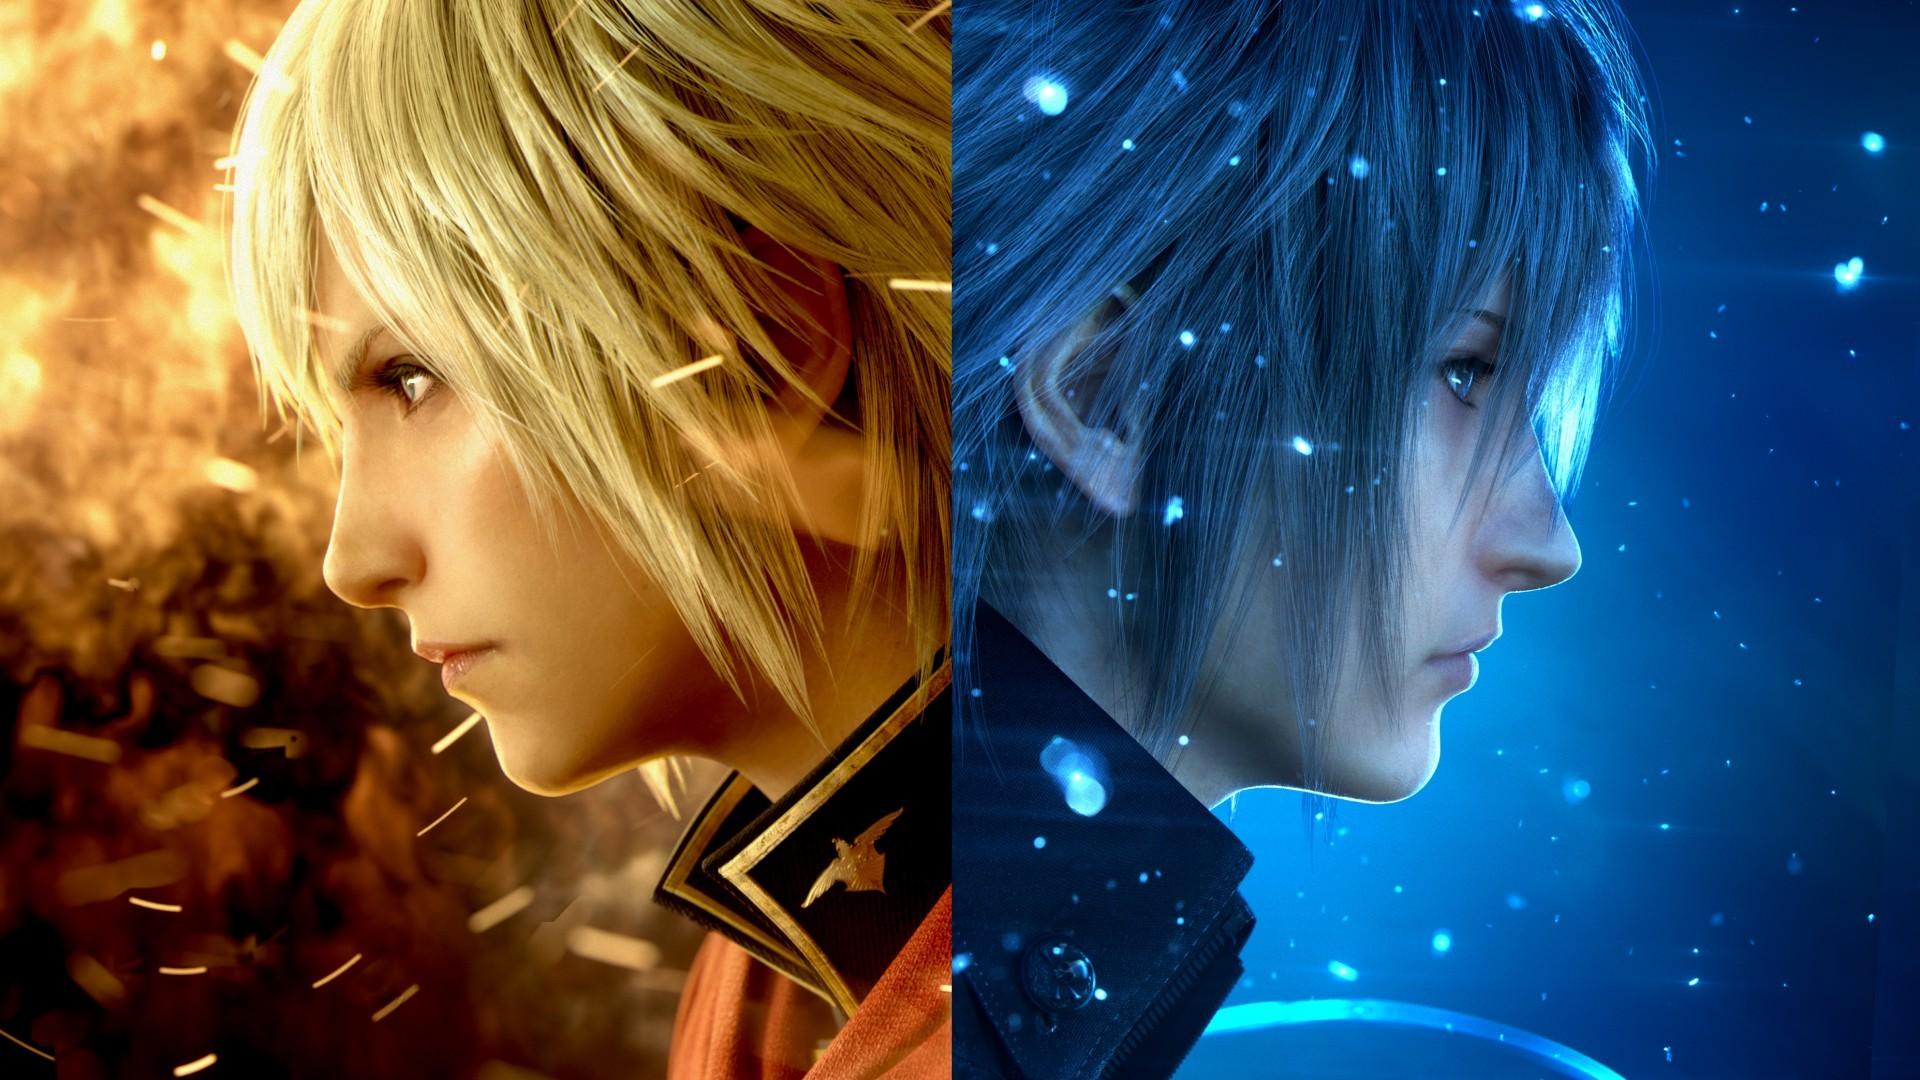 Final Fantasy XV HD Wallpaper (81+ images)